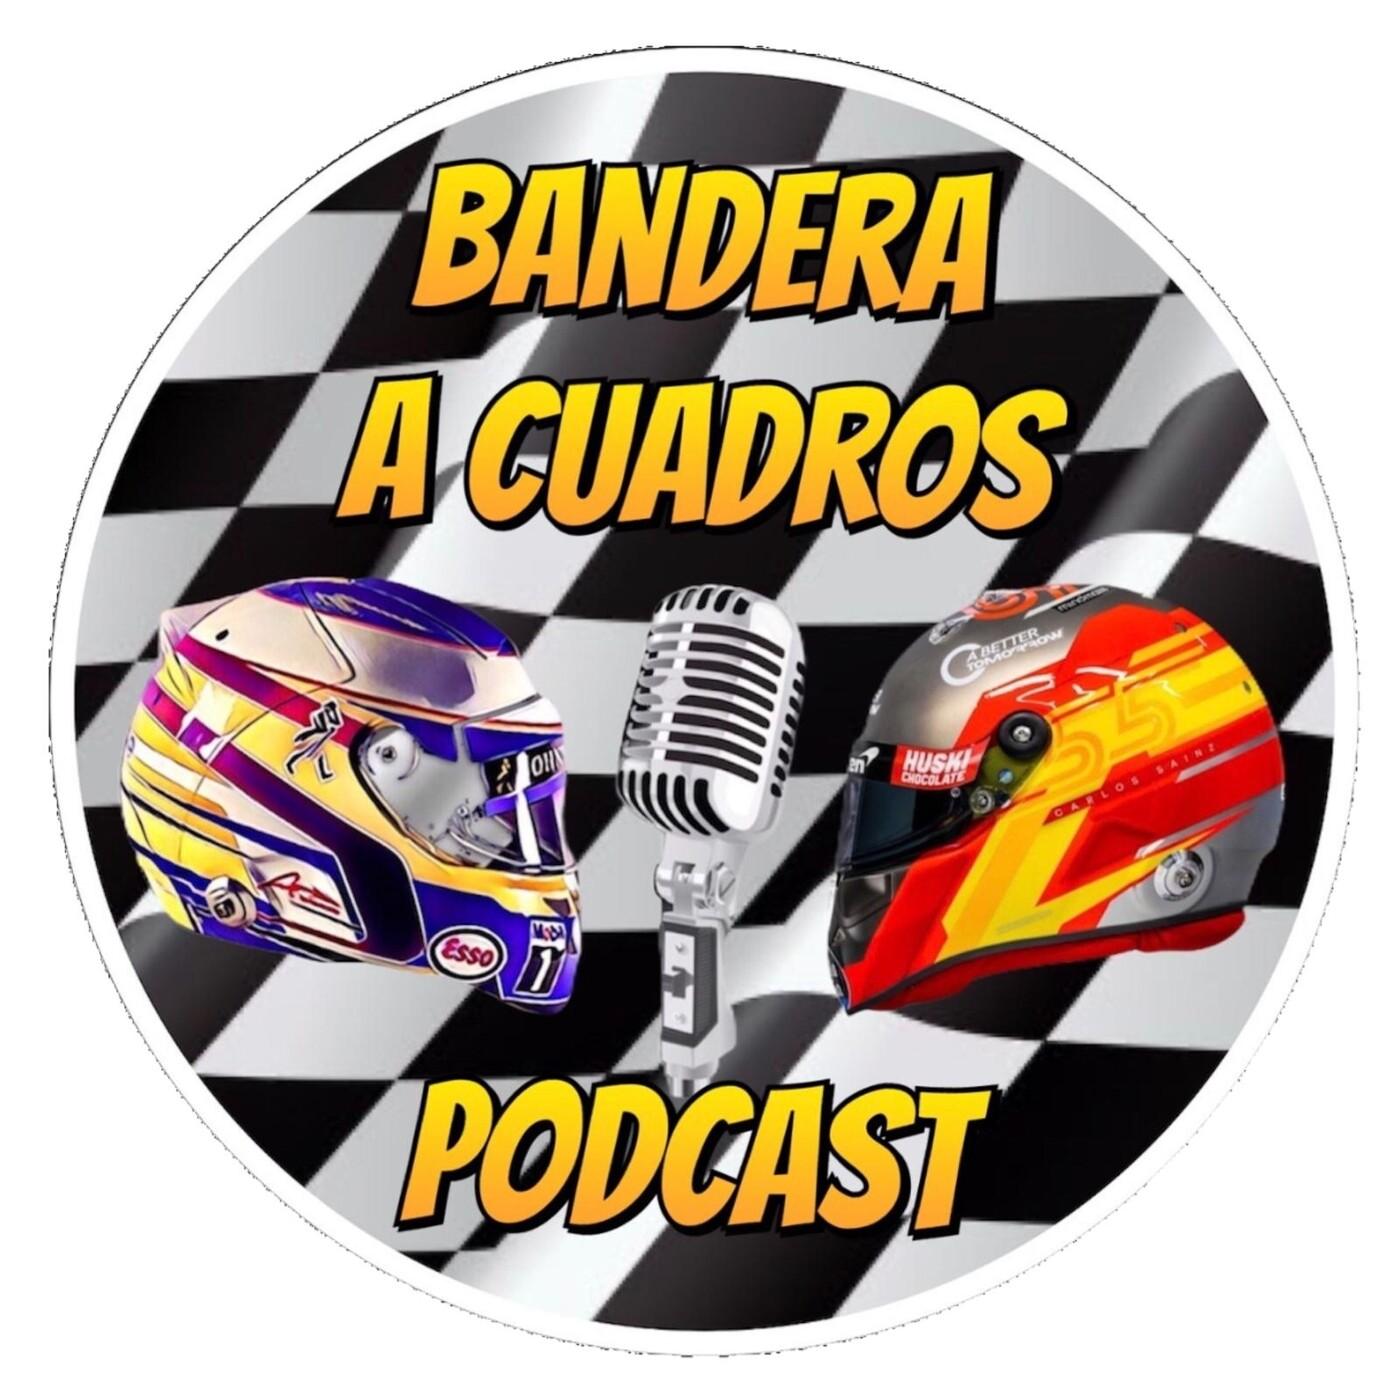 BANDERA A CUADROS- entrevista a Alex Palou, piloto de Formula 2